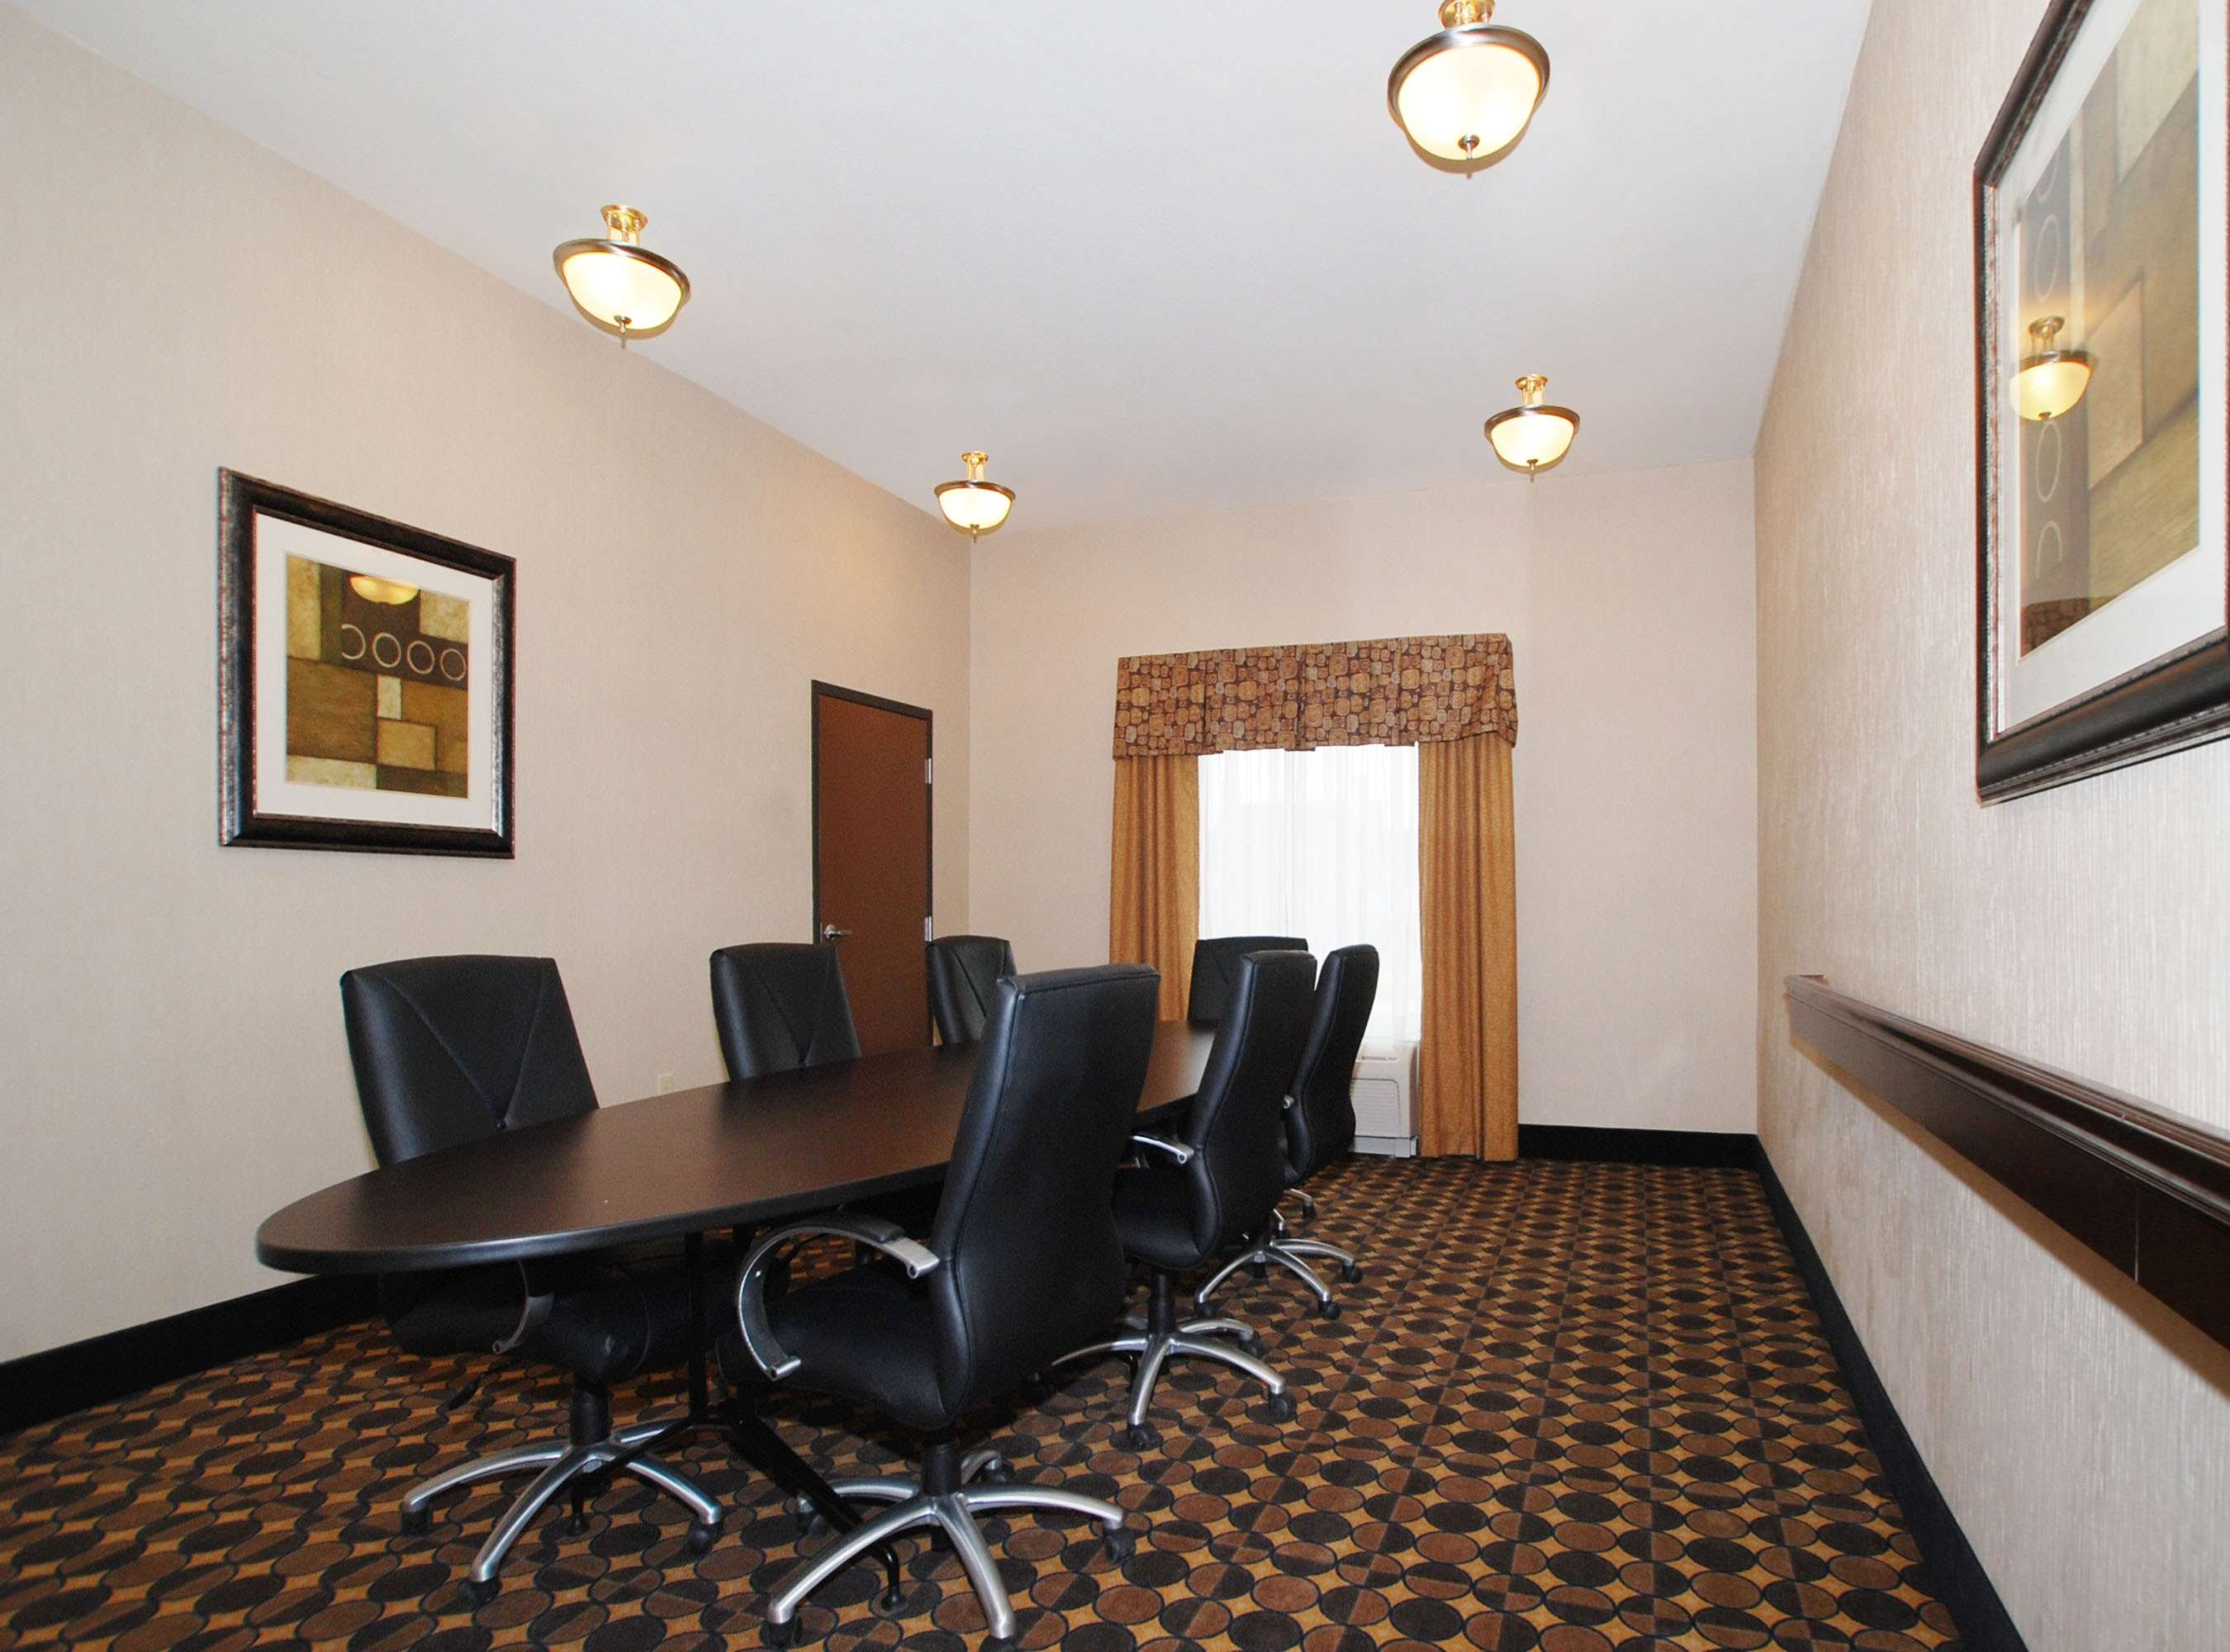 Hampton Inn & Suites Childress image 15